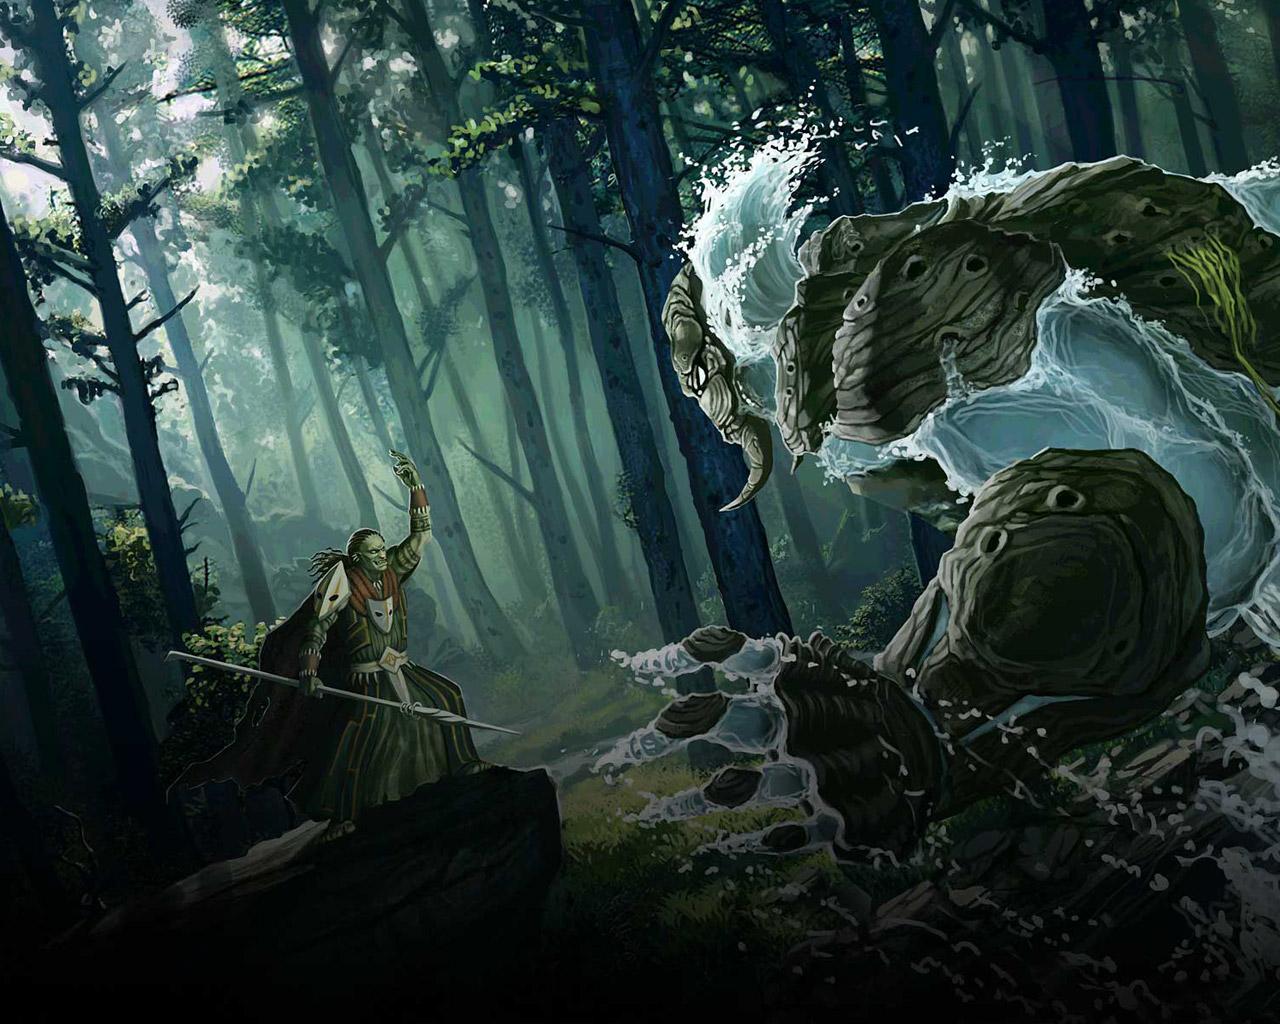 Free Age of Wonders III Wallpaper in 1280x1024